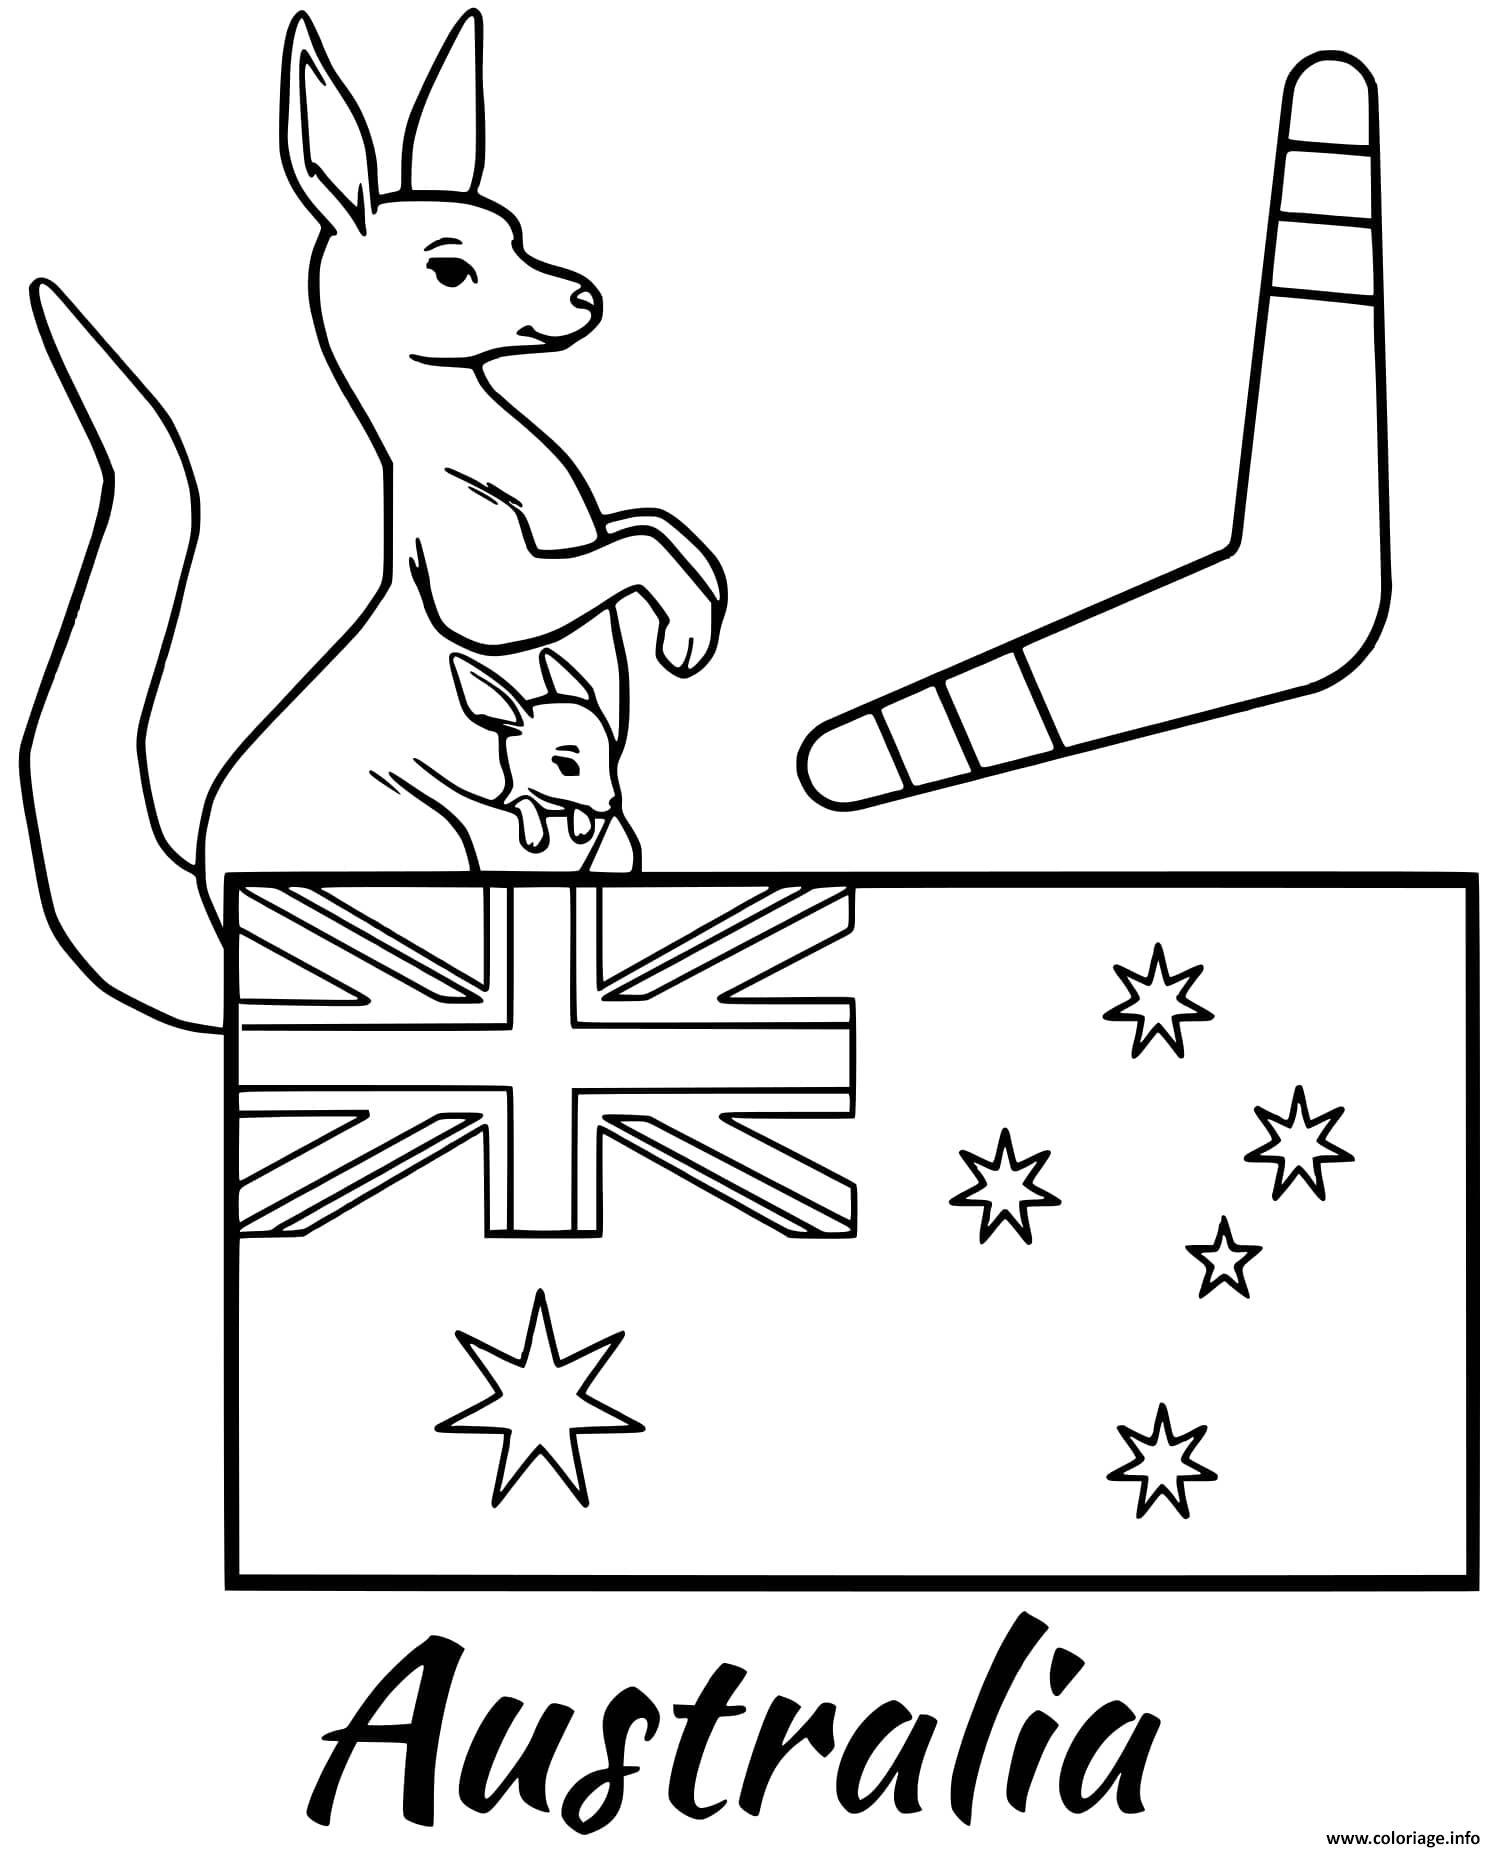 Coloriage Australie Drapeau Boomerang dessin